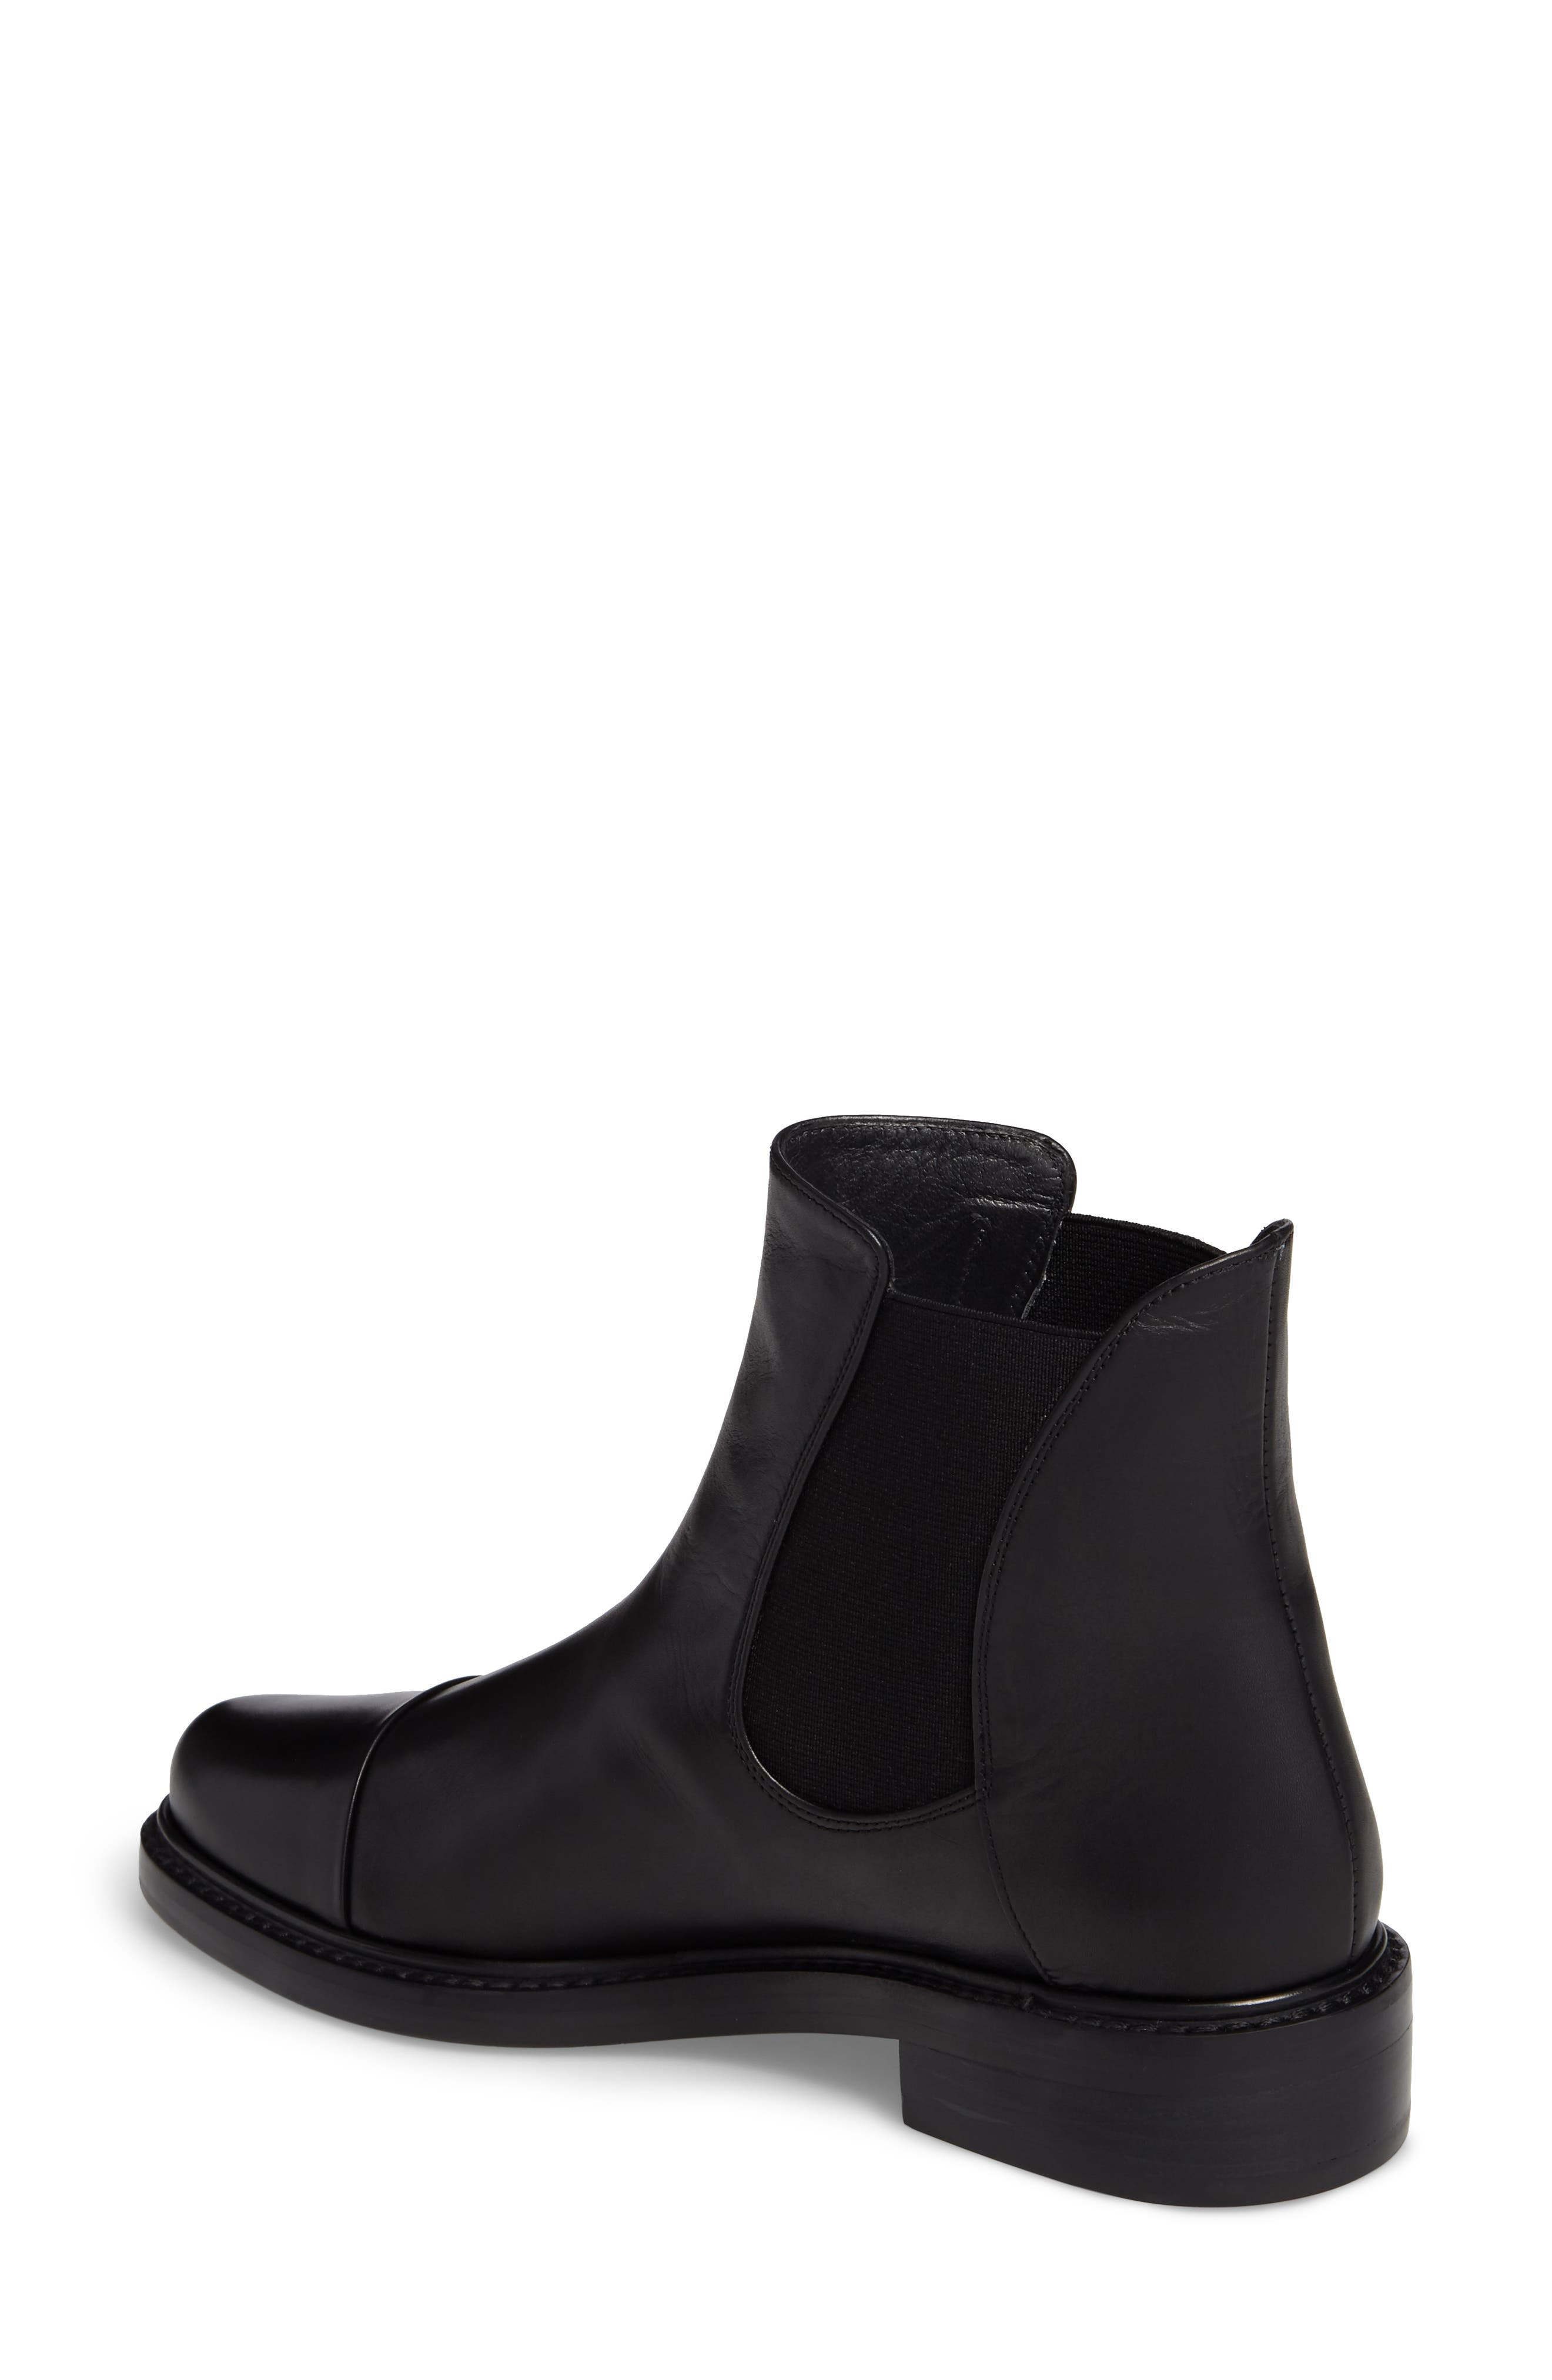 Gobi Cap Toe Chelsea Boot,                             Alternate thumbnail 2, color,                             Black Calf